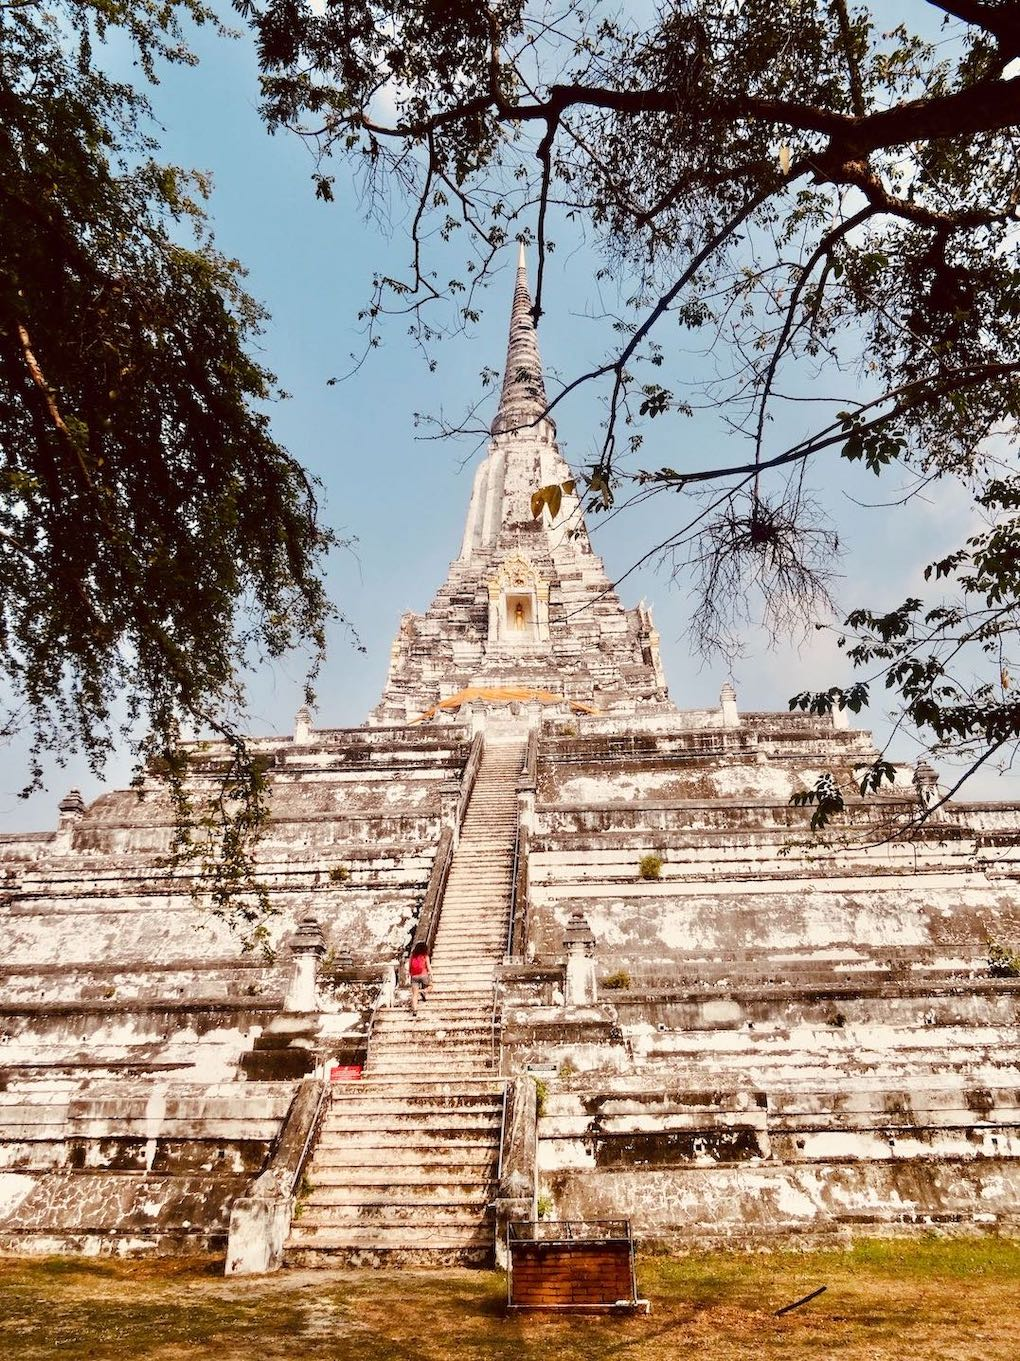 Wat Phu Khao Thong Ayutthaya Historical Park